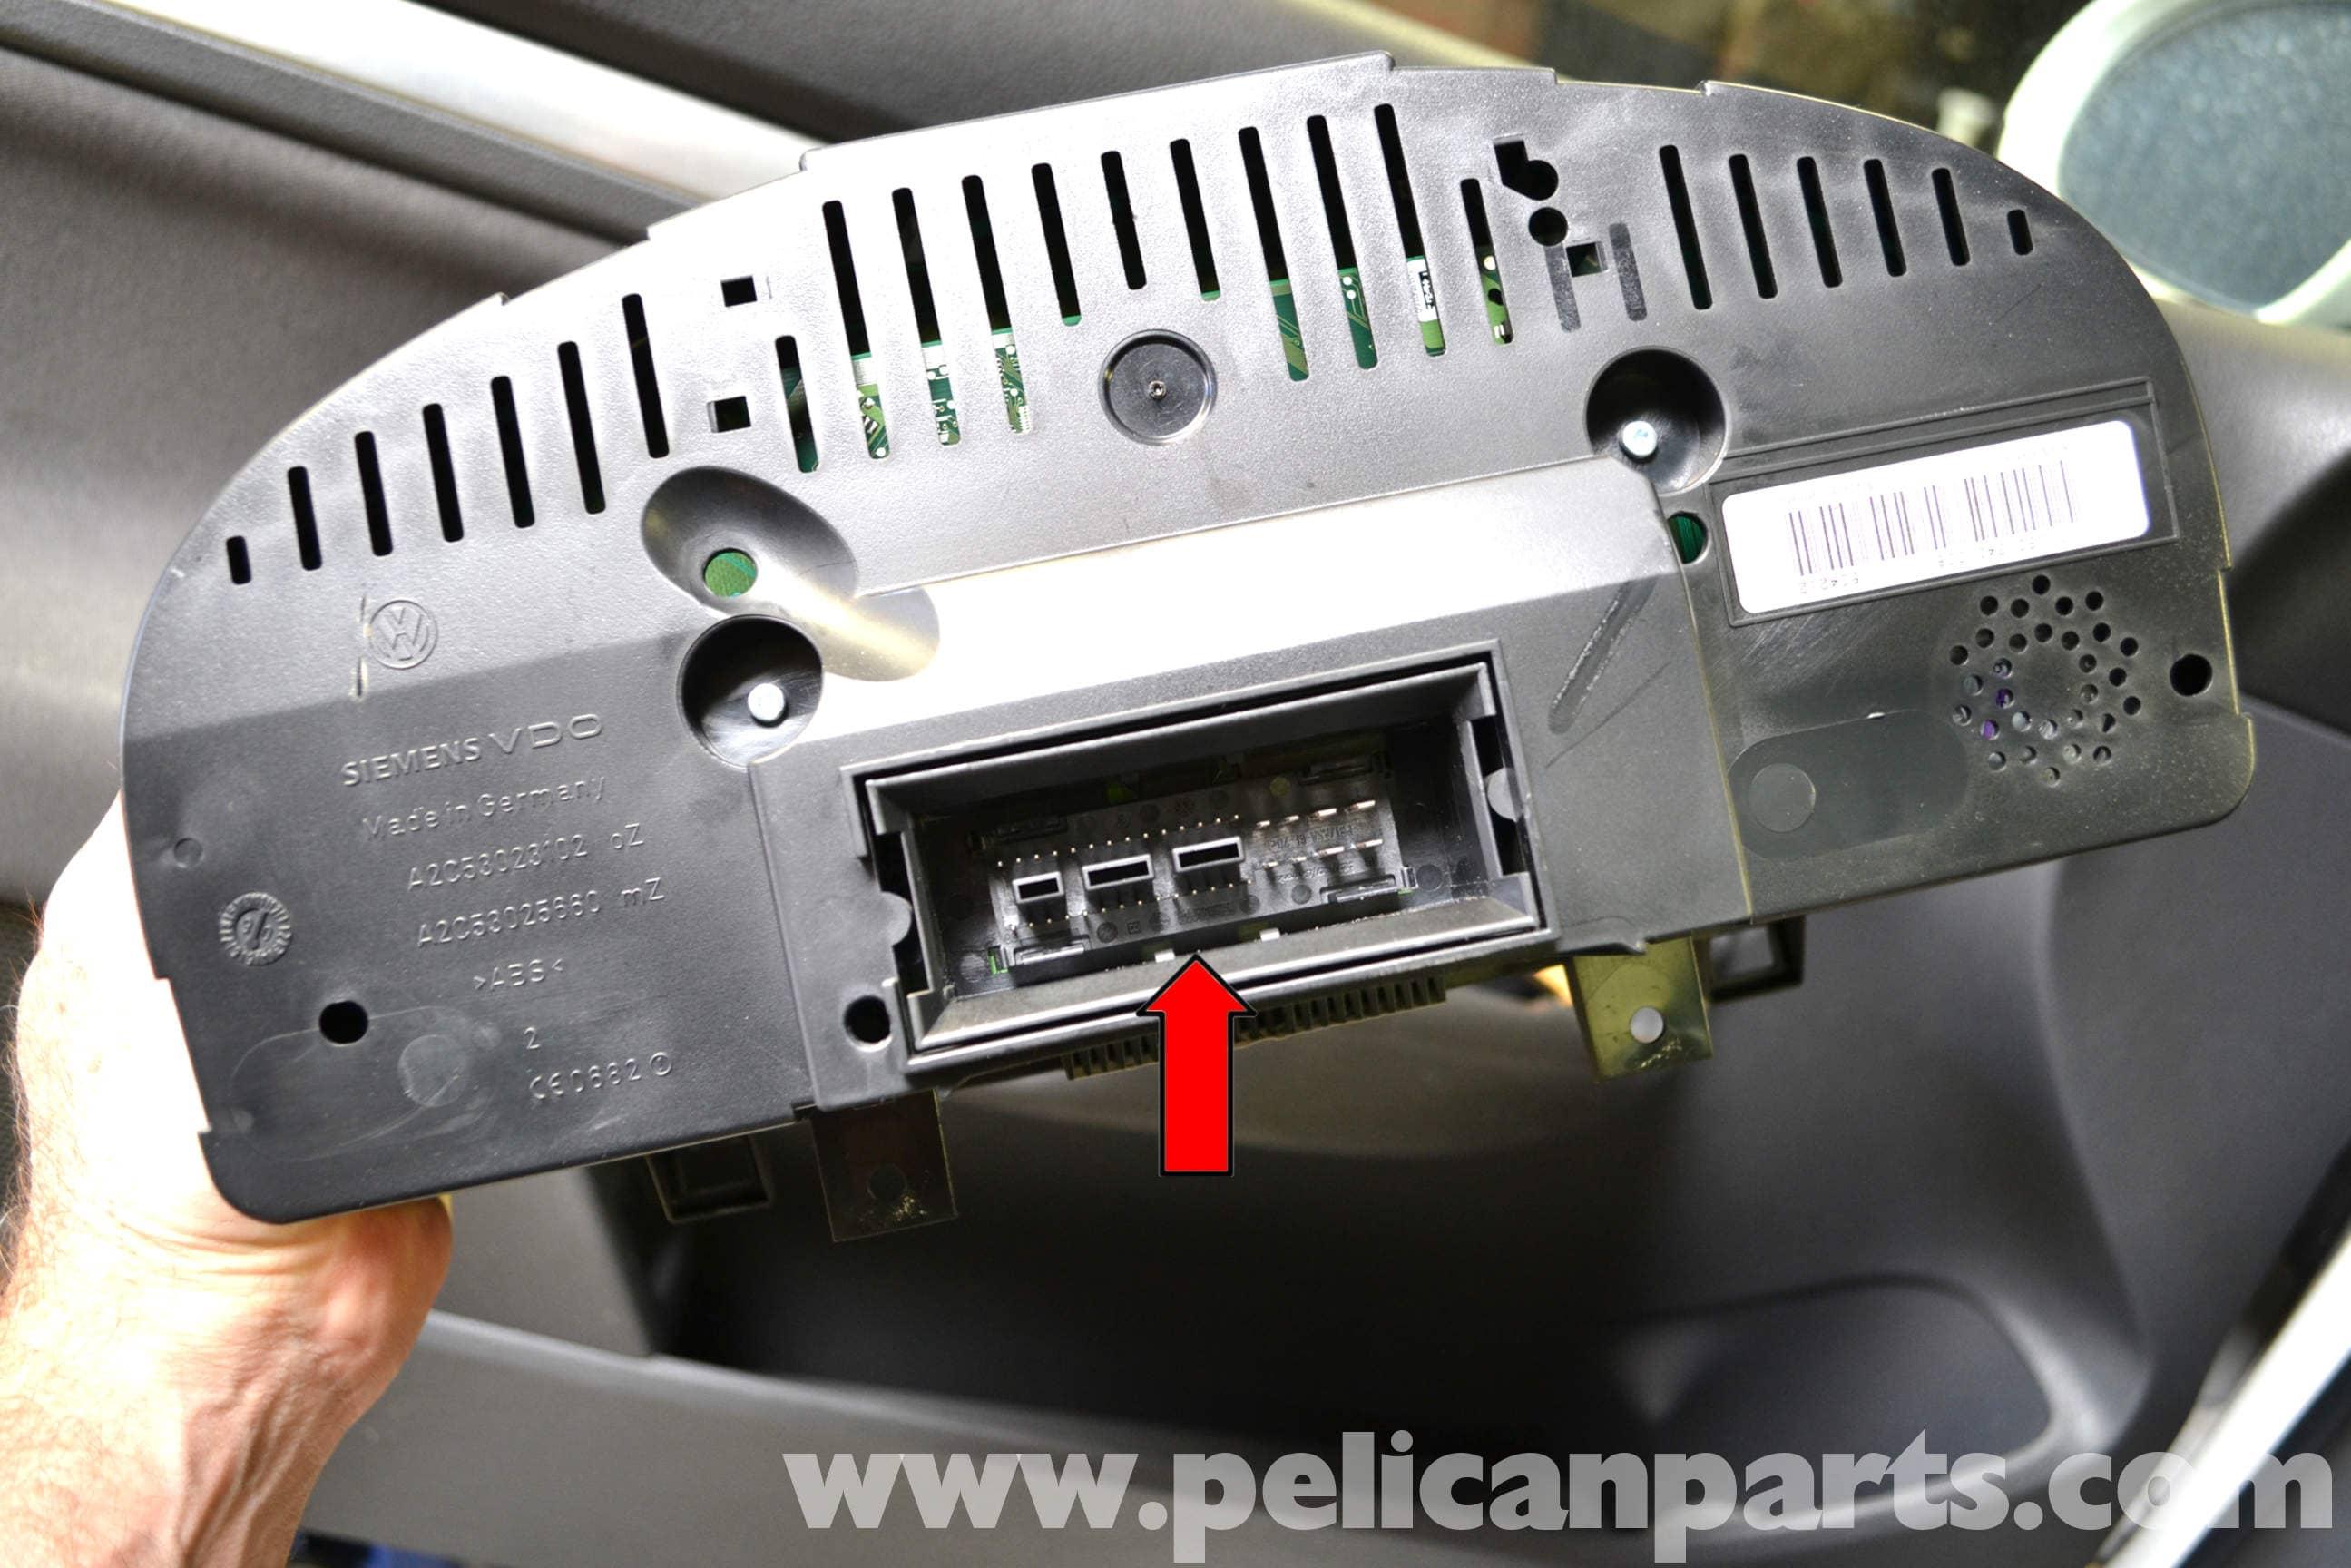 Volkswagen Golf GTI Mk V Instrument Cluster Removal (2006